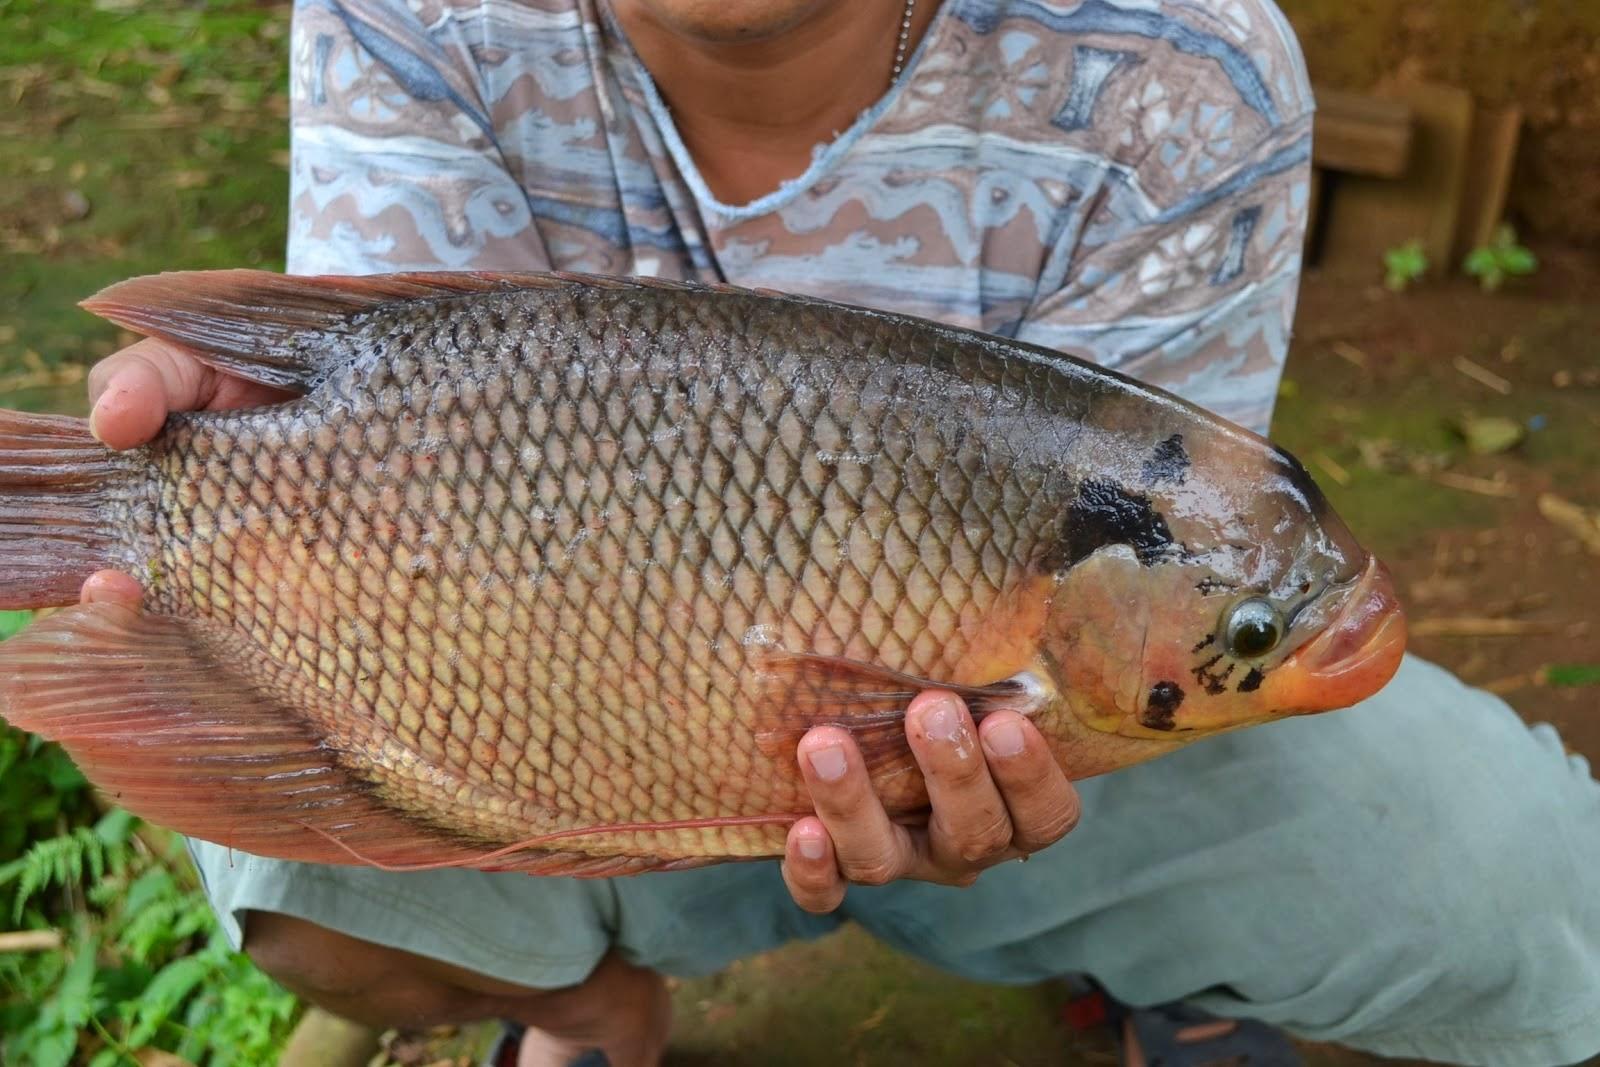 Mancing Mania Umpan Ikan Mas 1 | newhairstylesformen2014.com